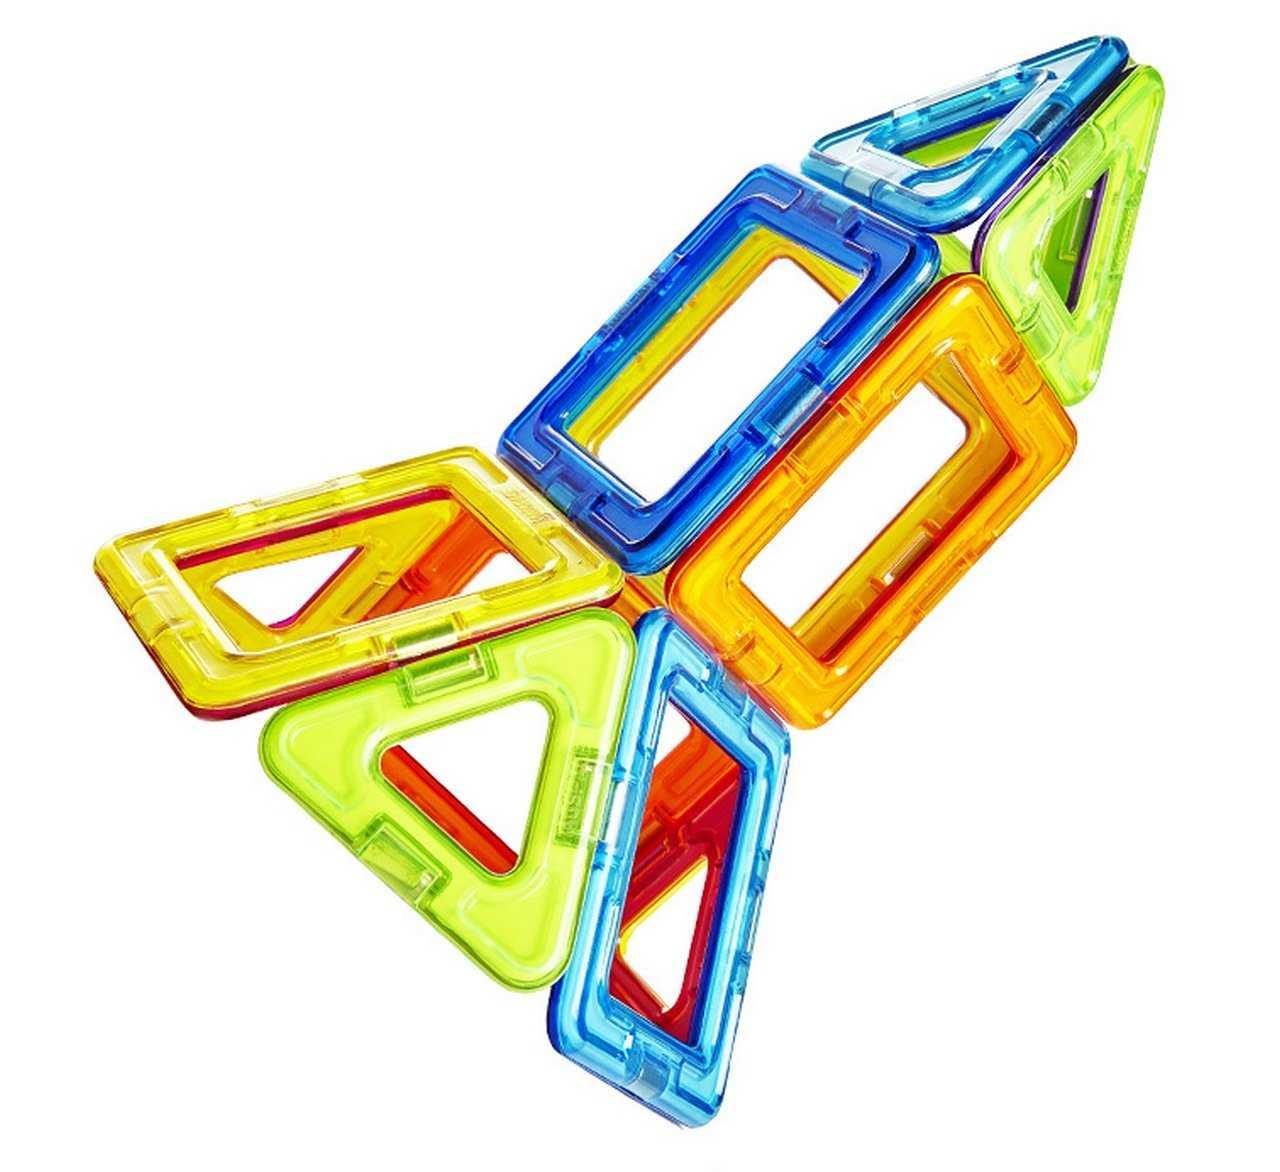 Magplayer magnetická stavebnice 14 ks